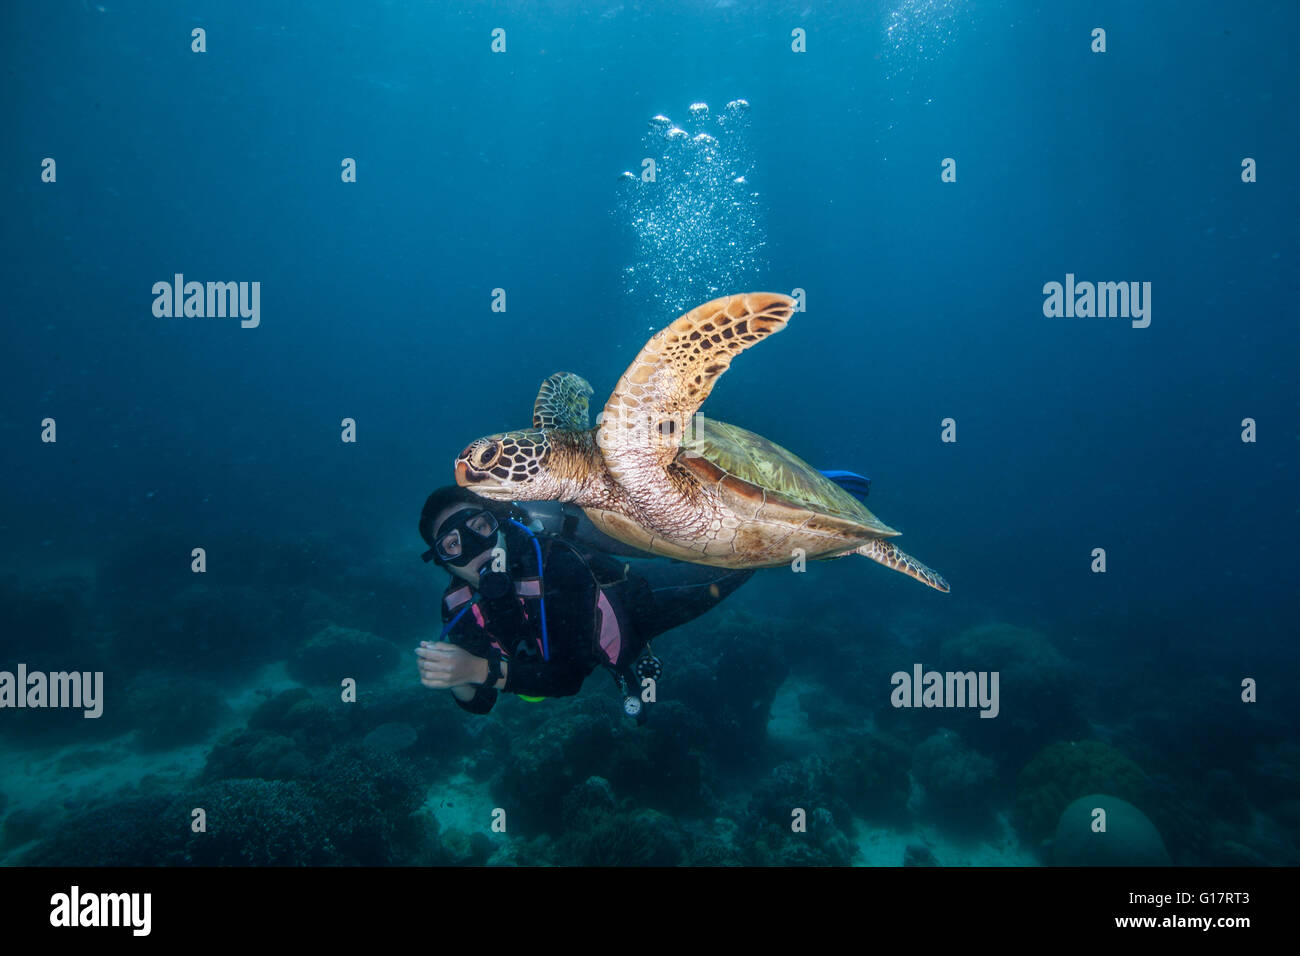 Young woman swimming with rare green sea turtle (Chelonia Mydas),, Cebu, Philippines - Stock Image